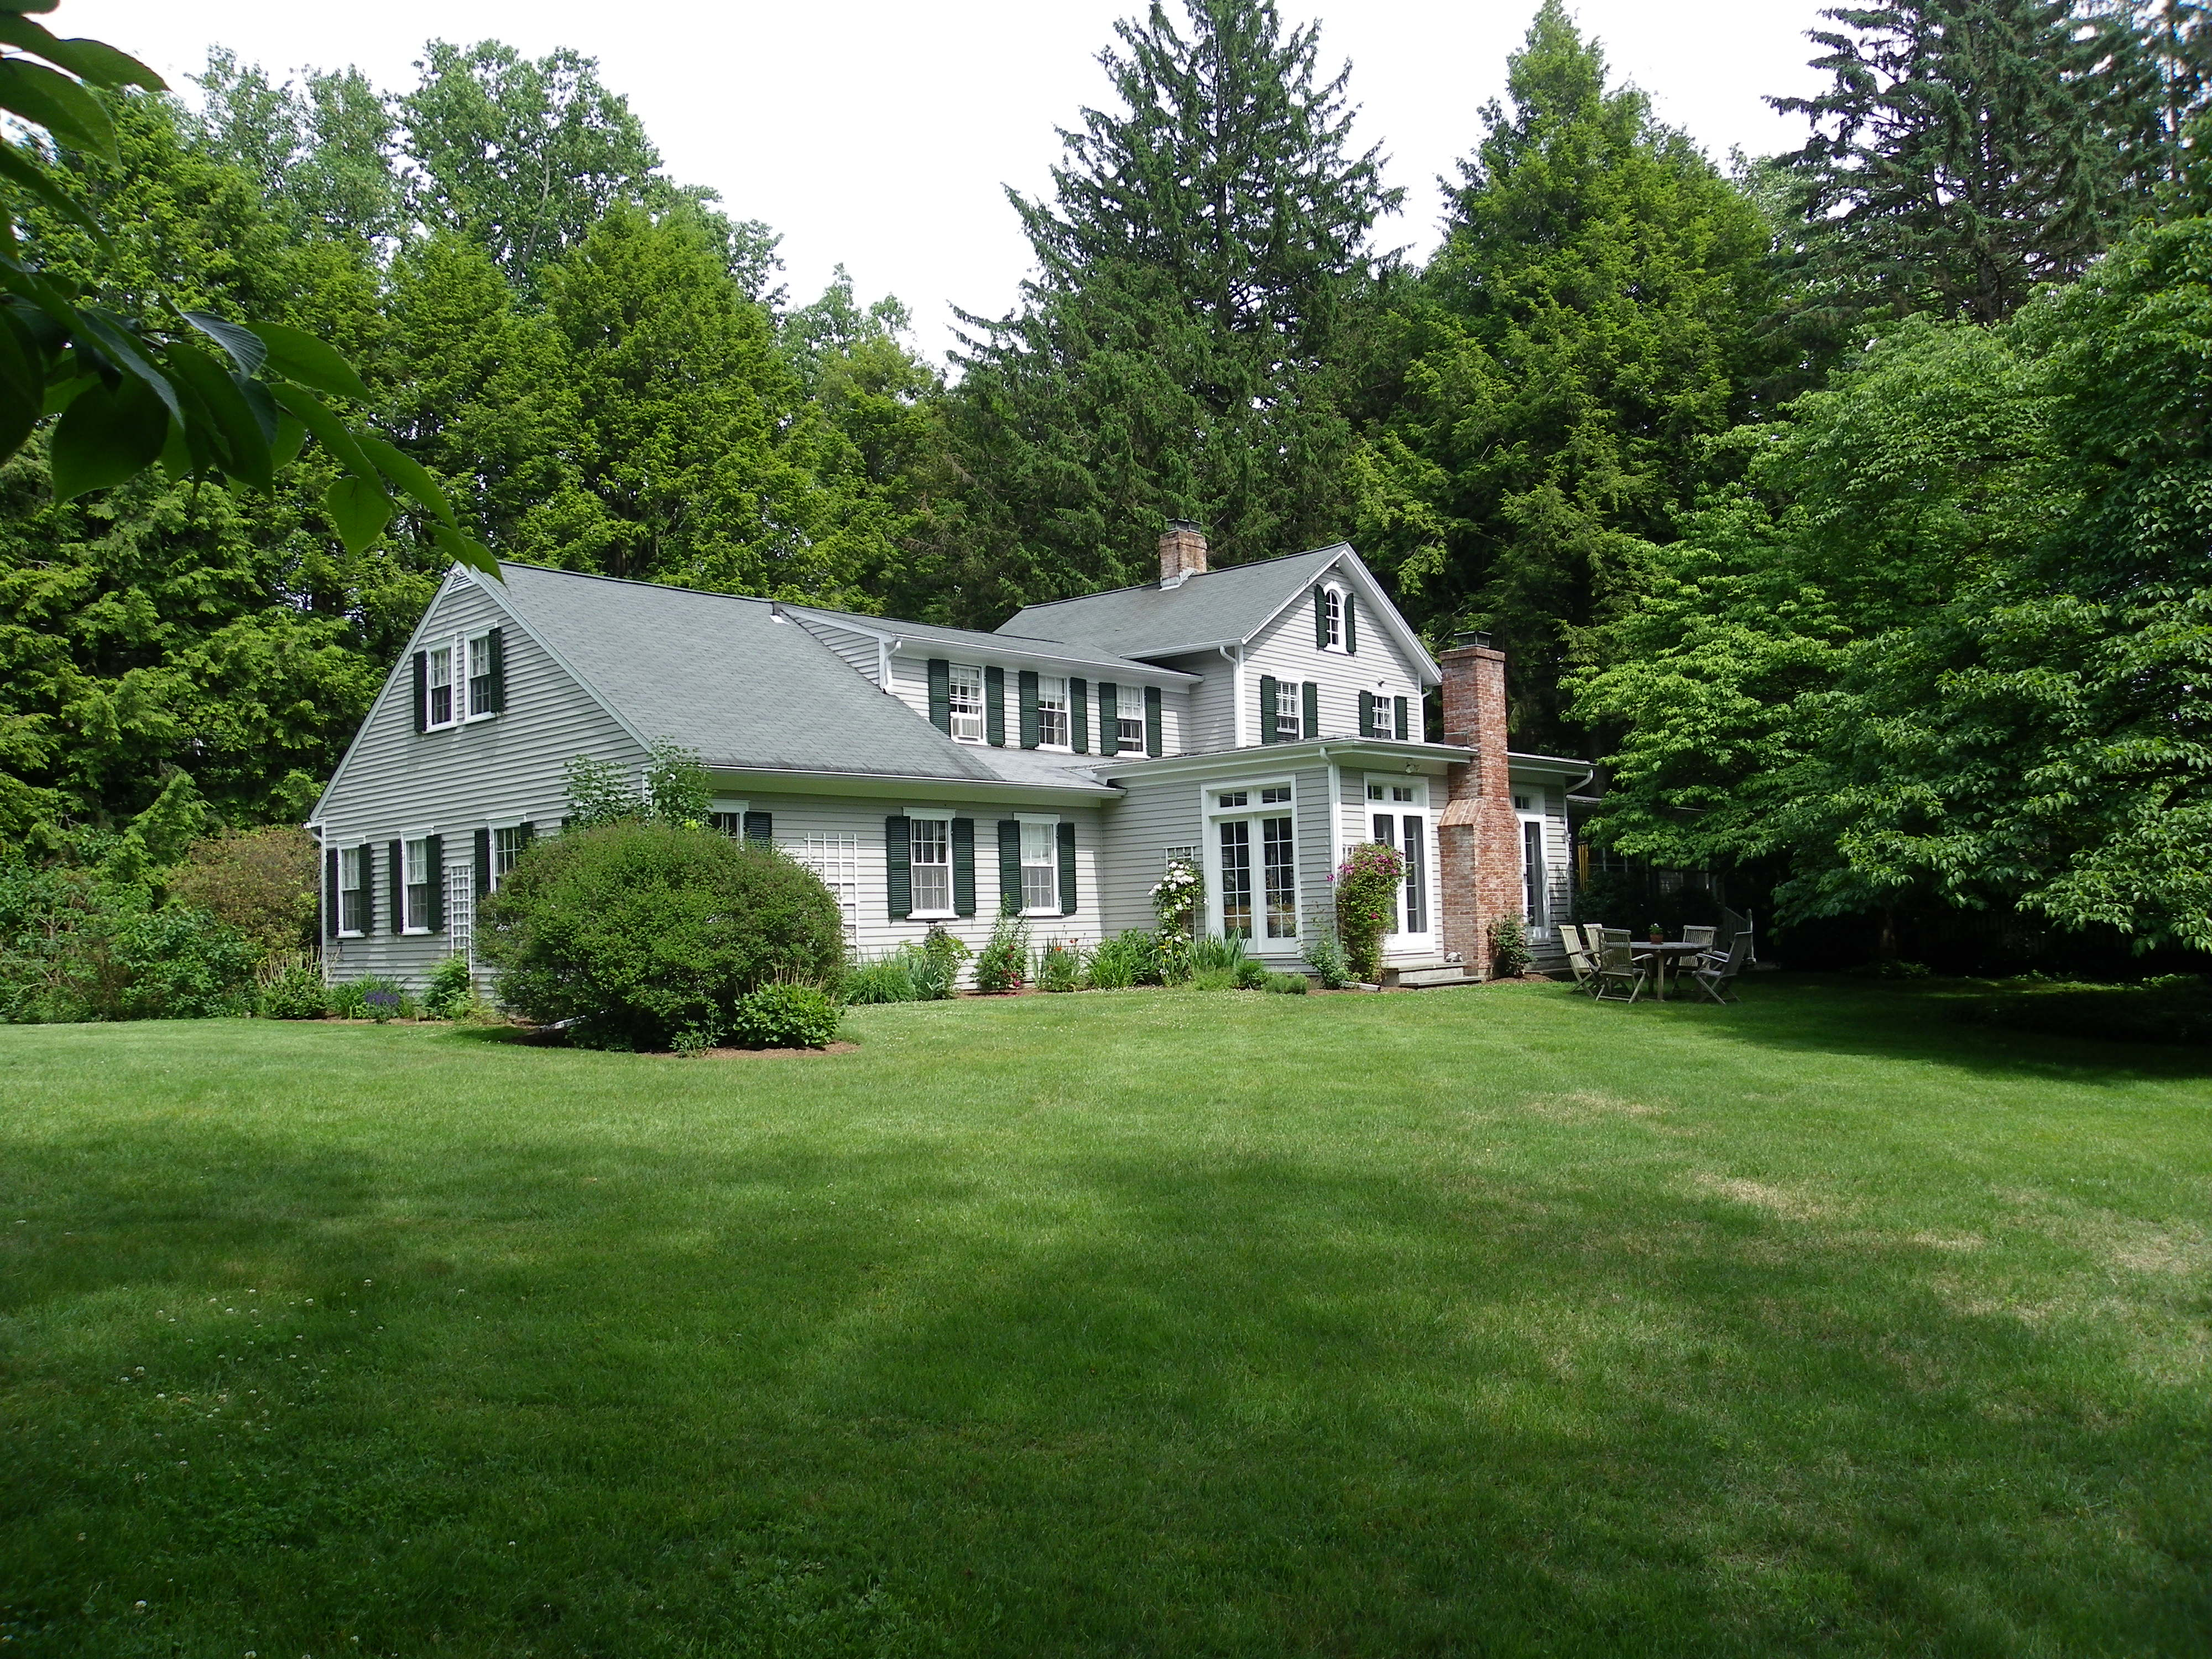 独户住宅 为 销售 在 Farm House in Pastoral Setting 17 Old Rock Lane Norwalk, 康涅狄格州 06850 美国